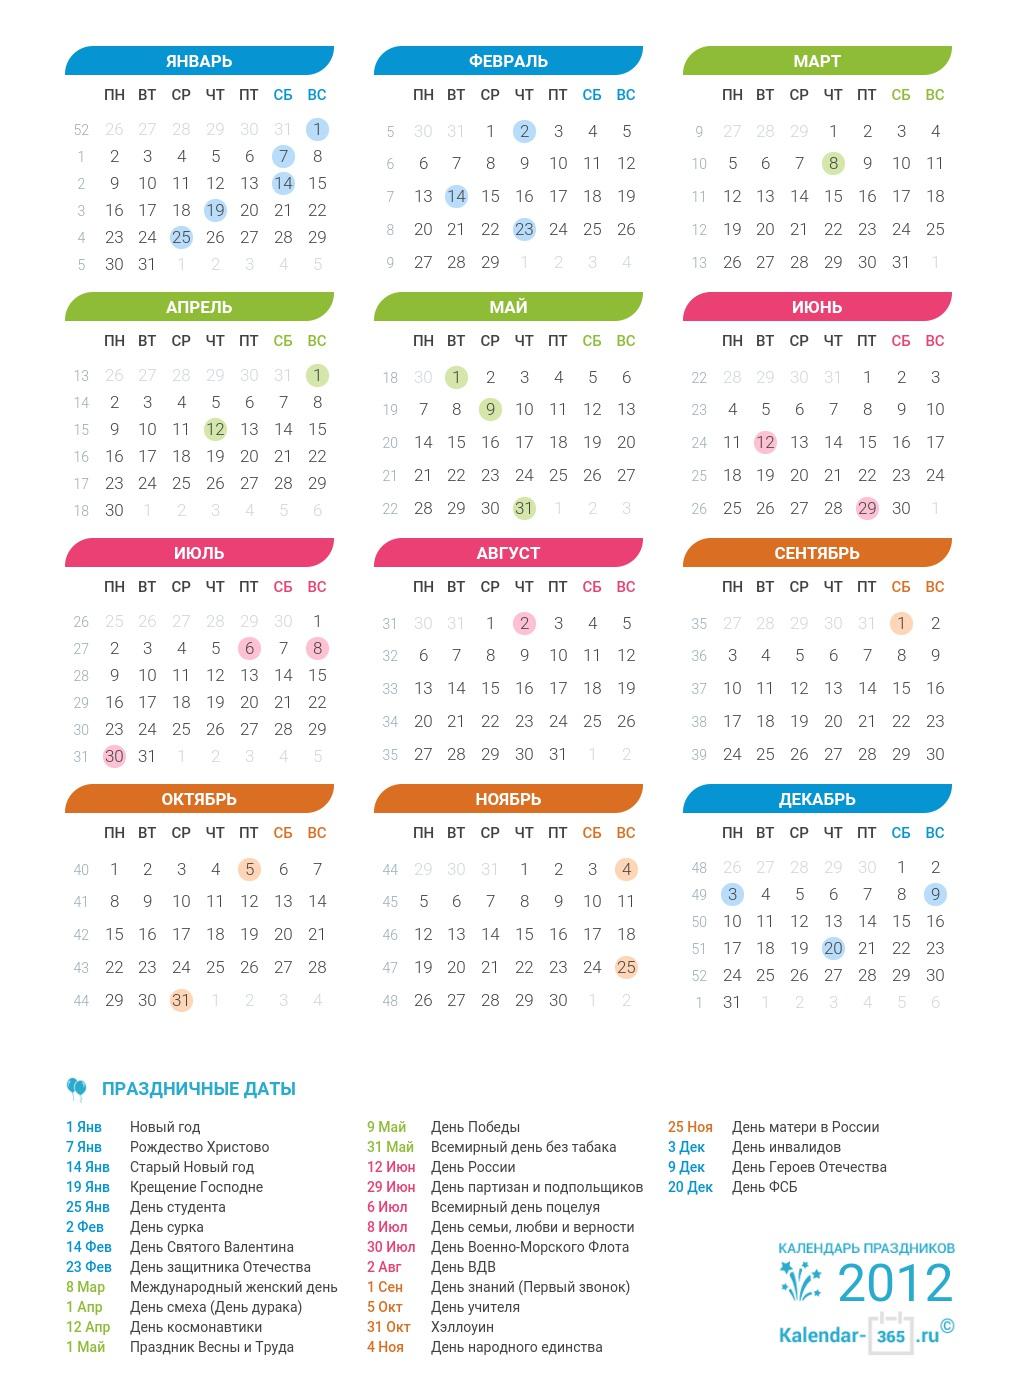 Секс календари 2012